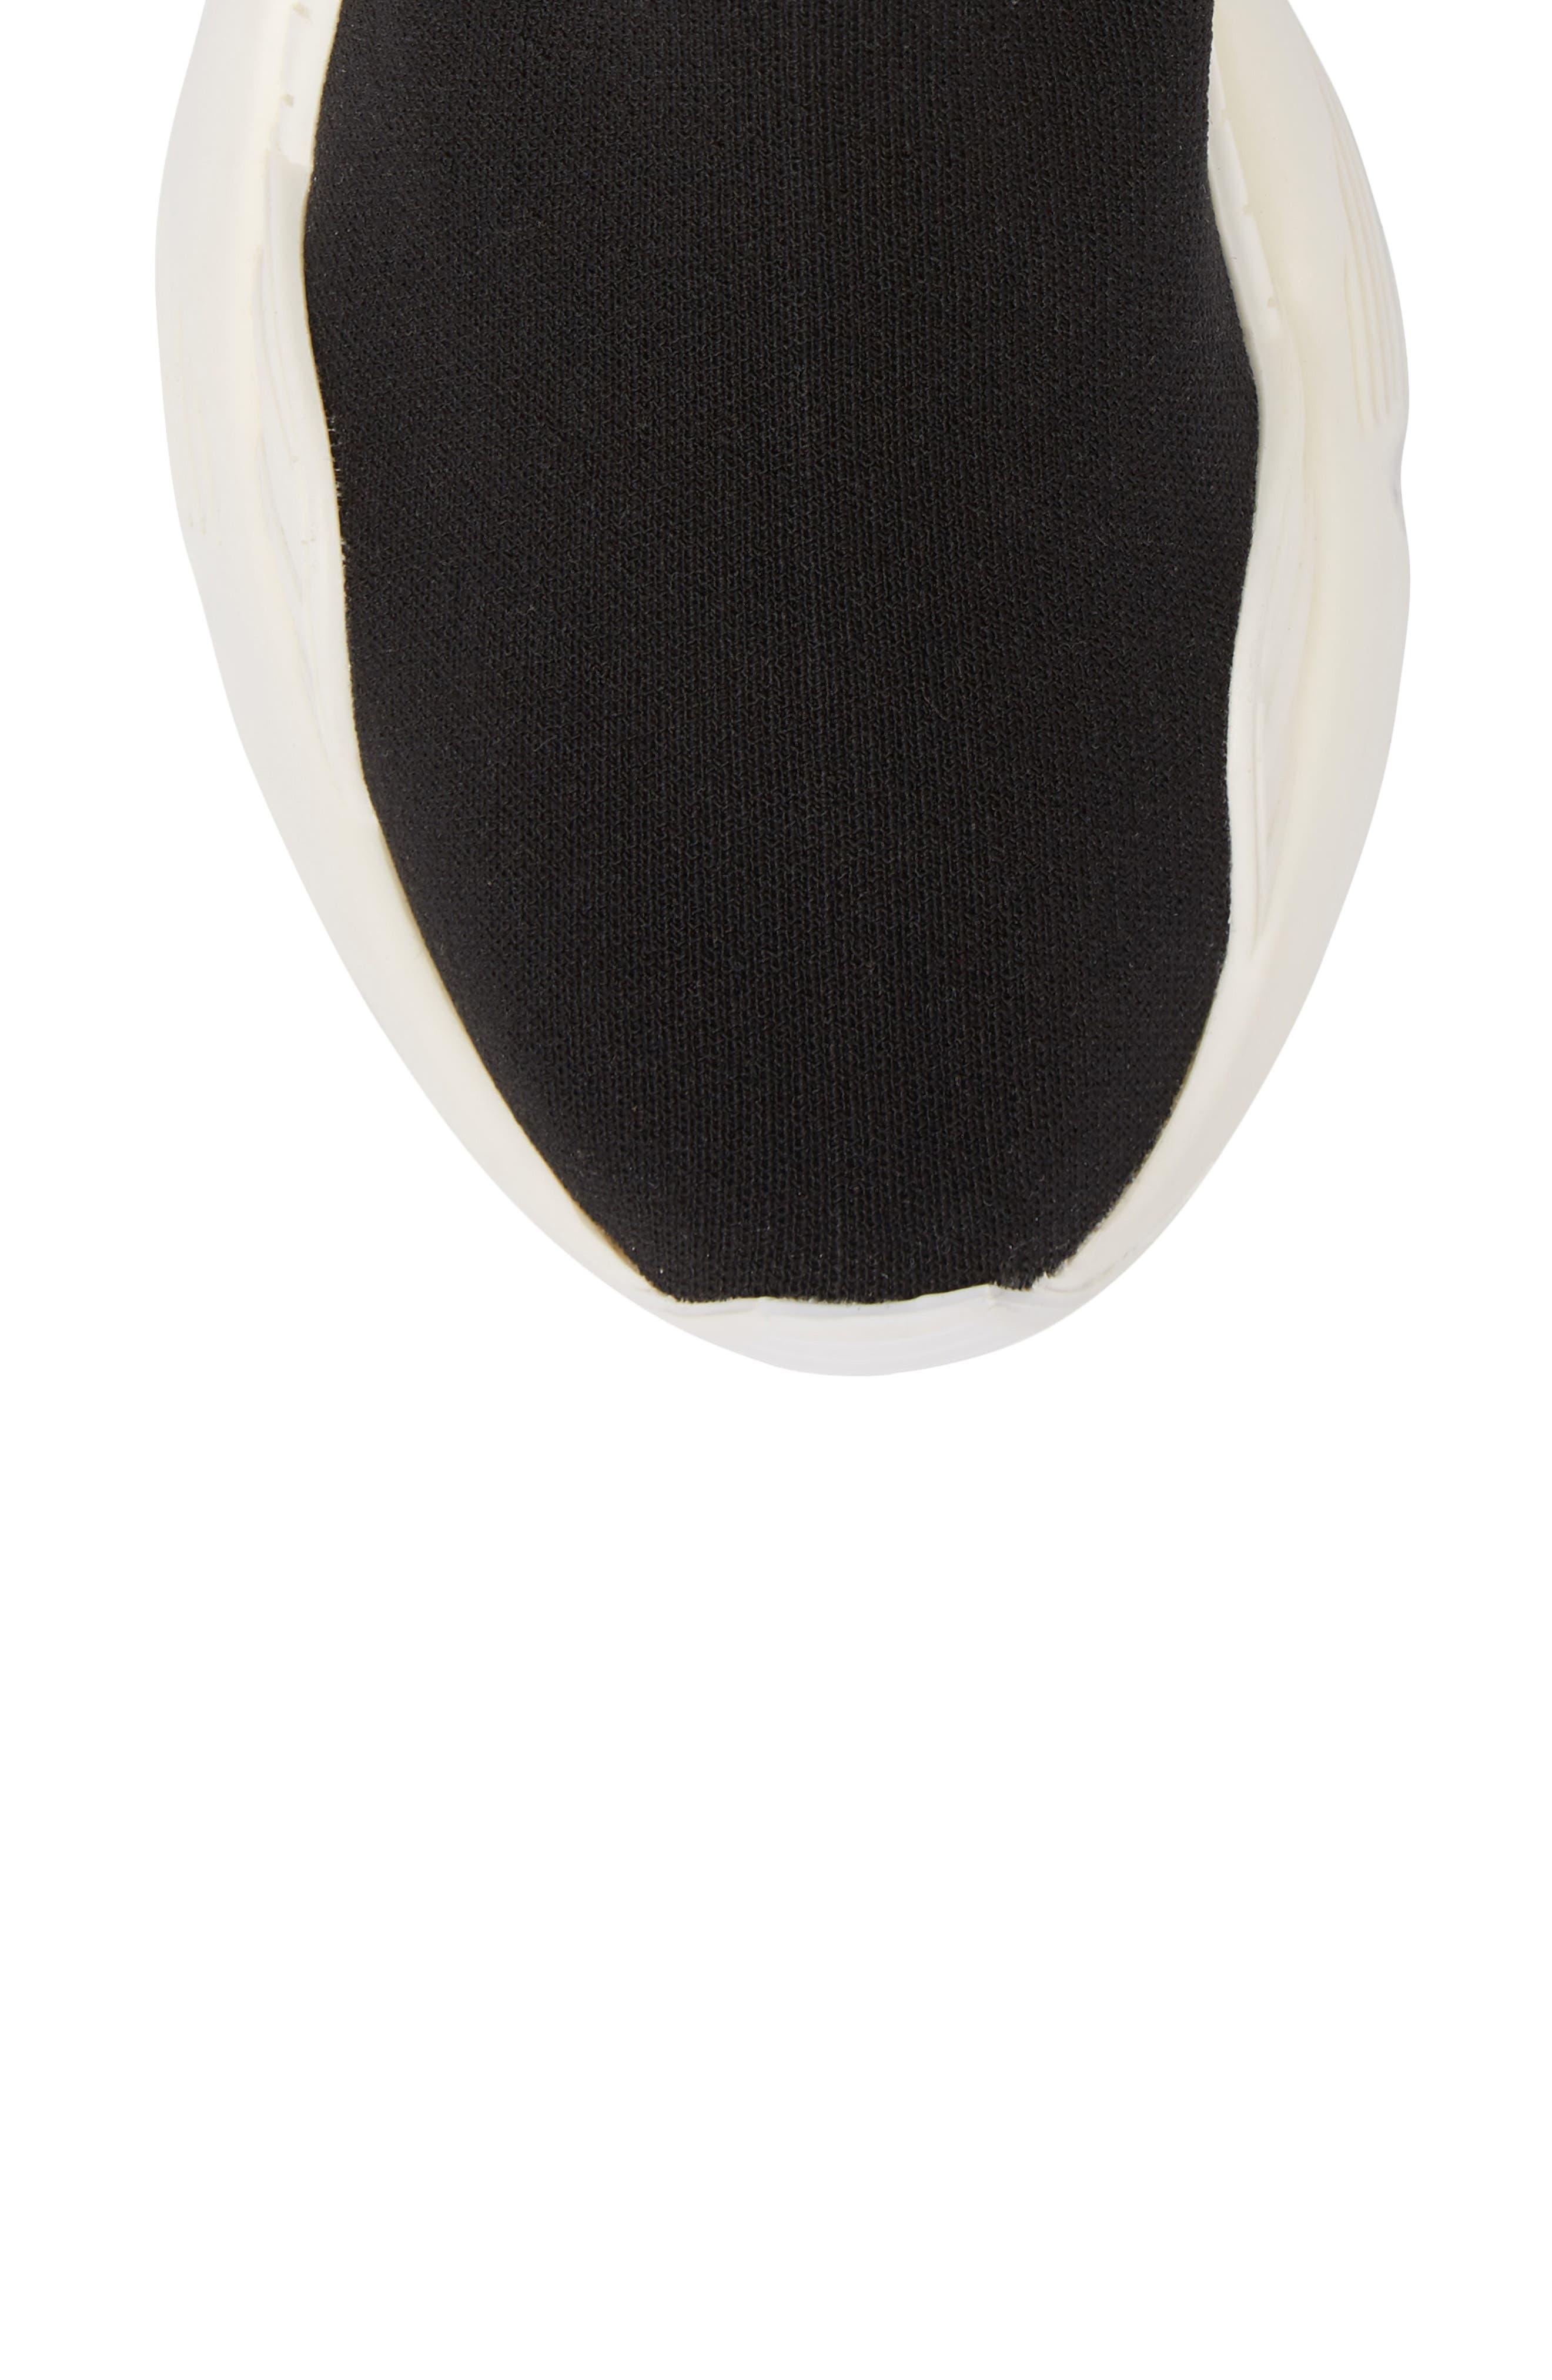 Lunix Sock Sneaker,                             Alternate thumbnail 5, color,                             Black/ White Leather